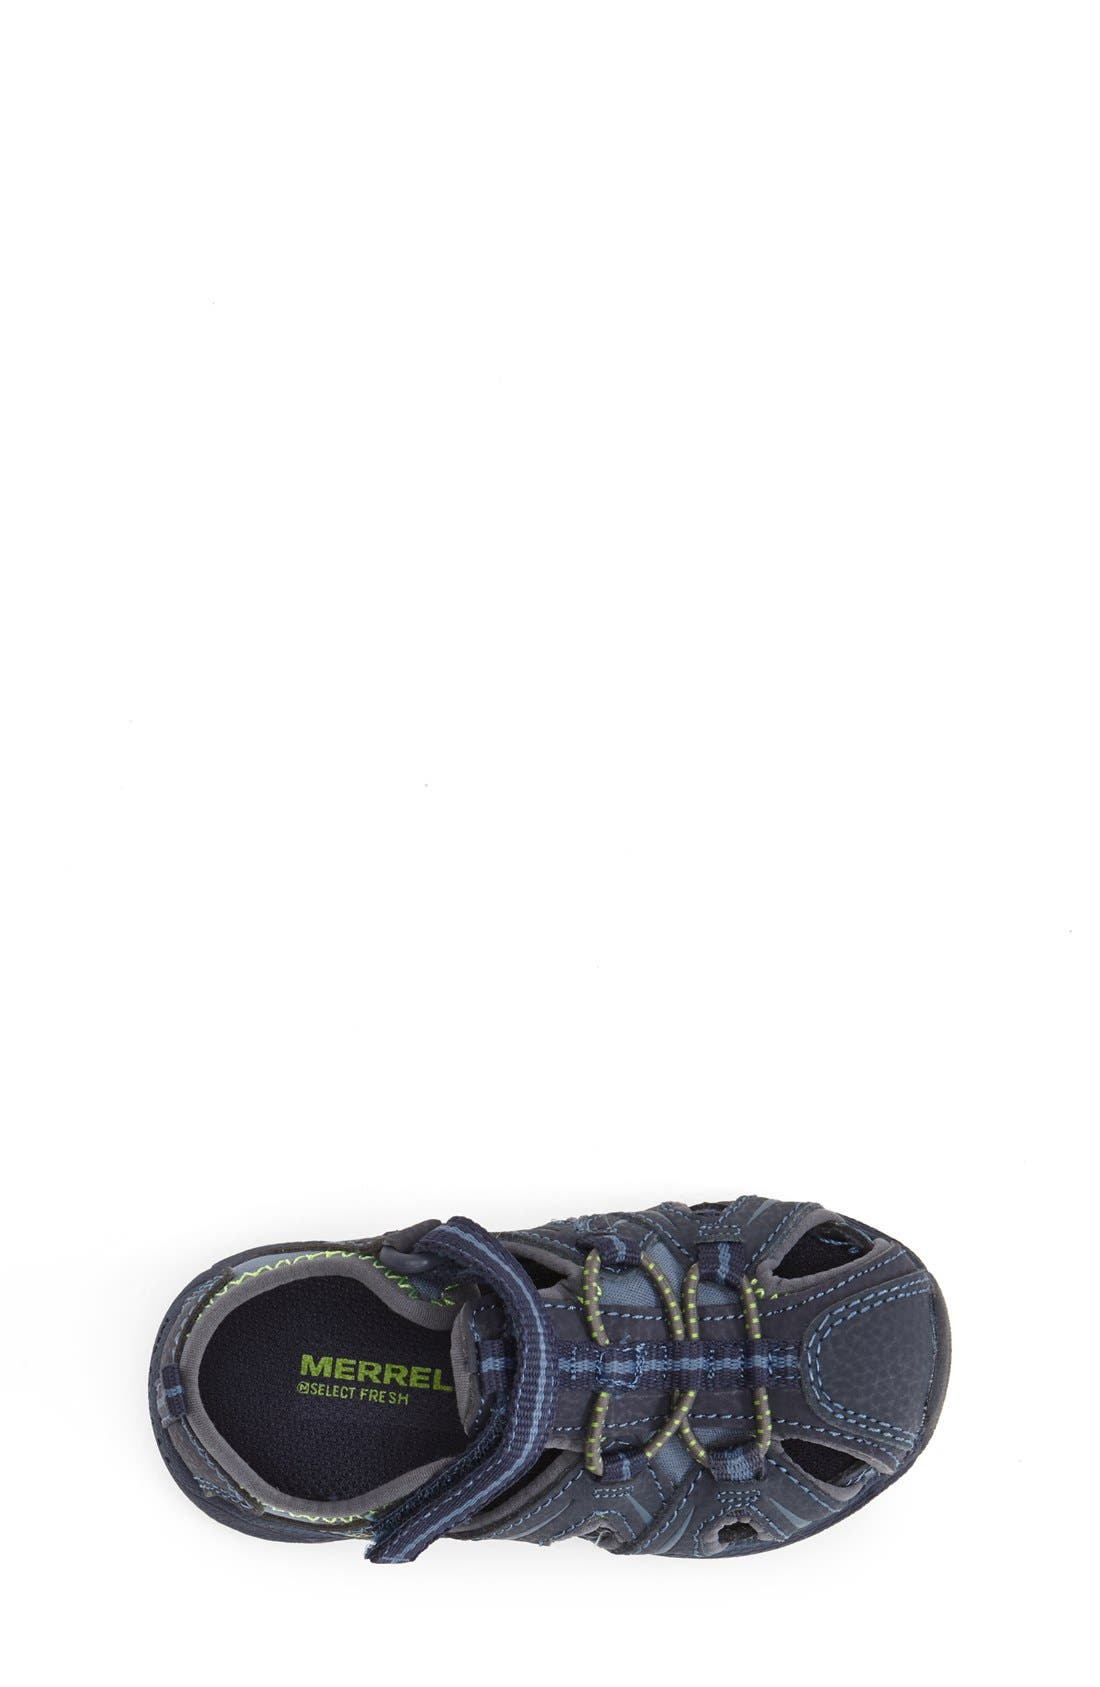 MERRELL, 'Hydro Junior' M-Select Water Sandal, Alternate thumbnail 2, color, NAVY/ GREEN